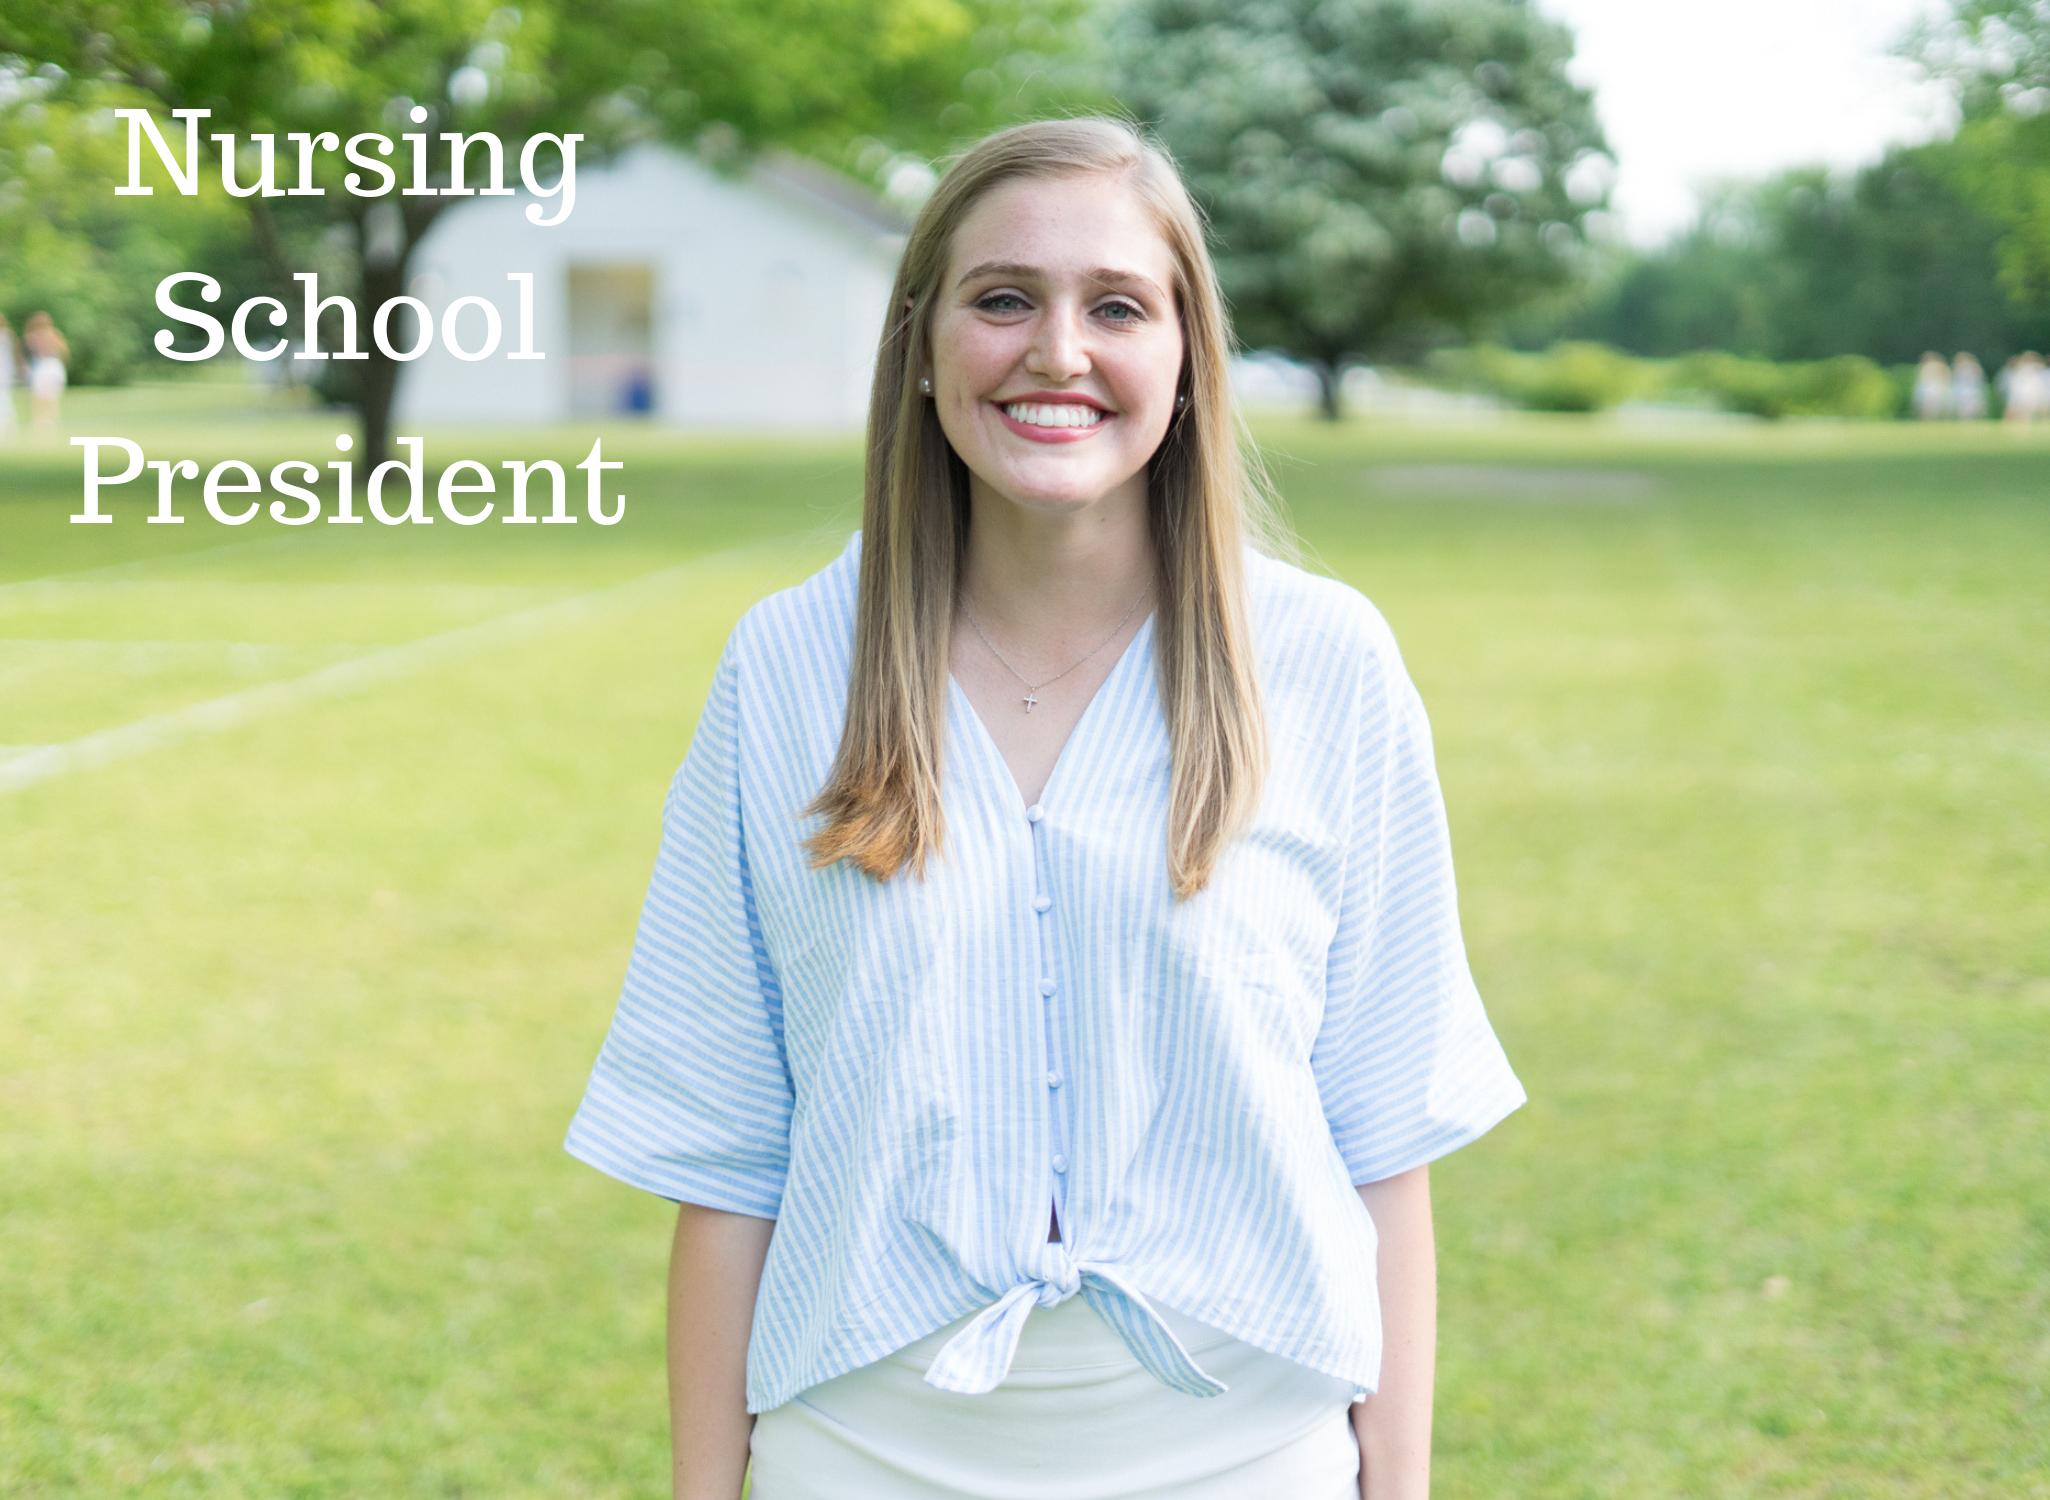 Nursing School President.png